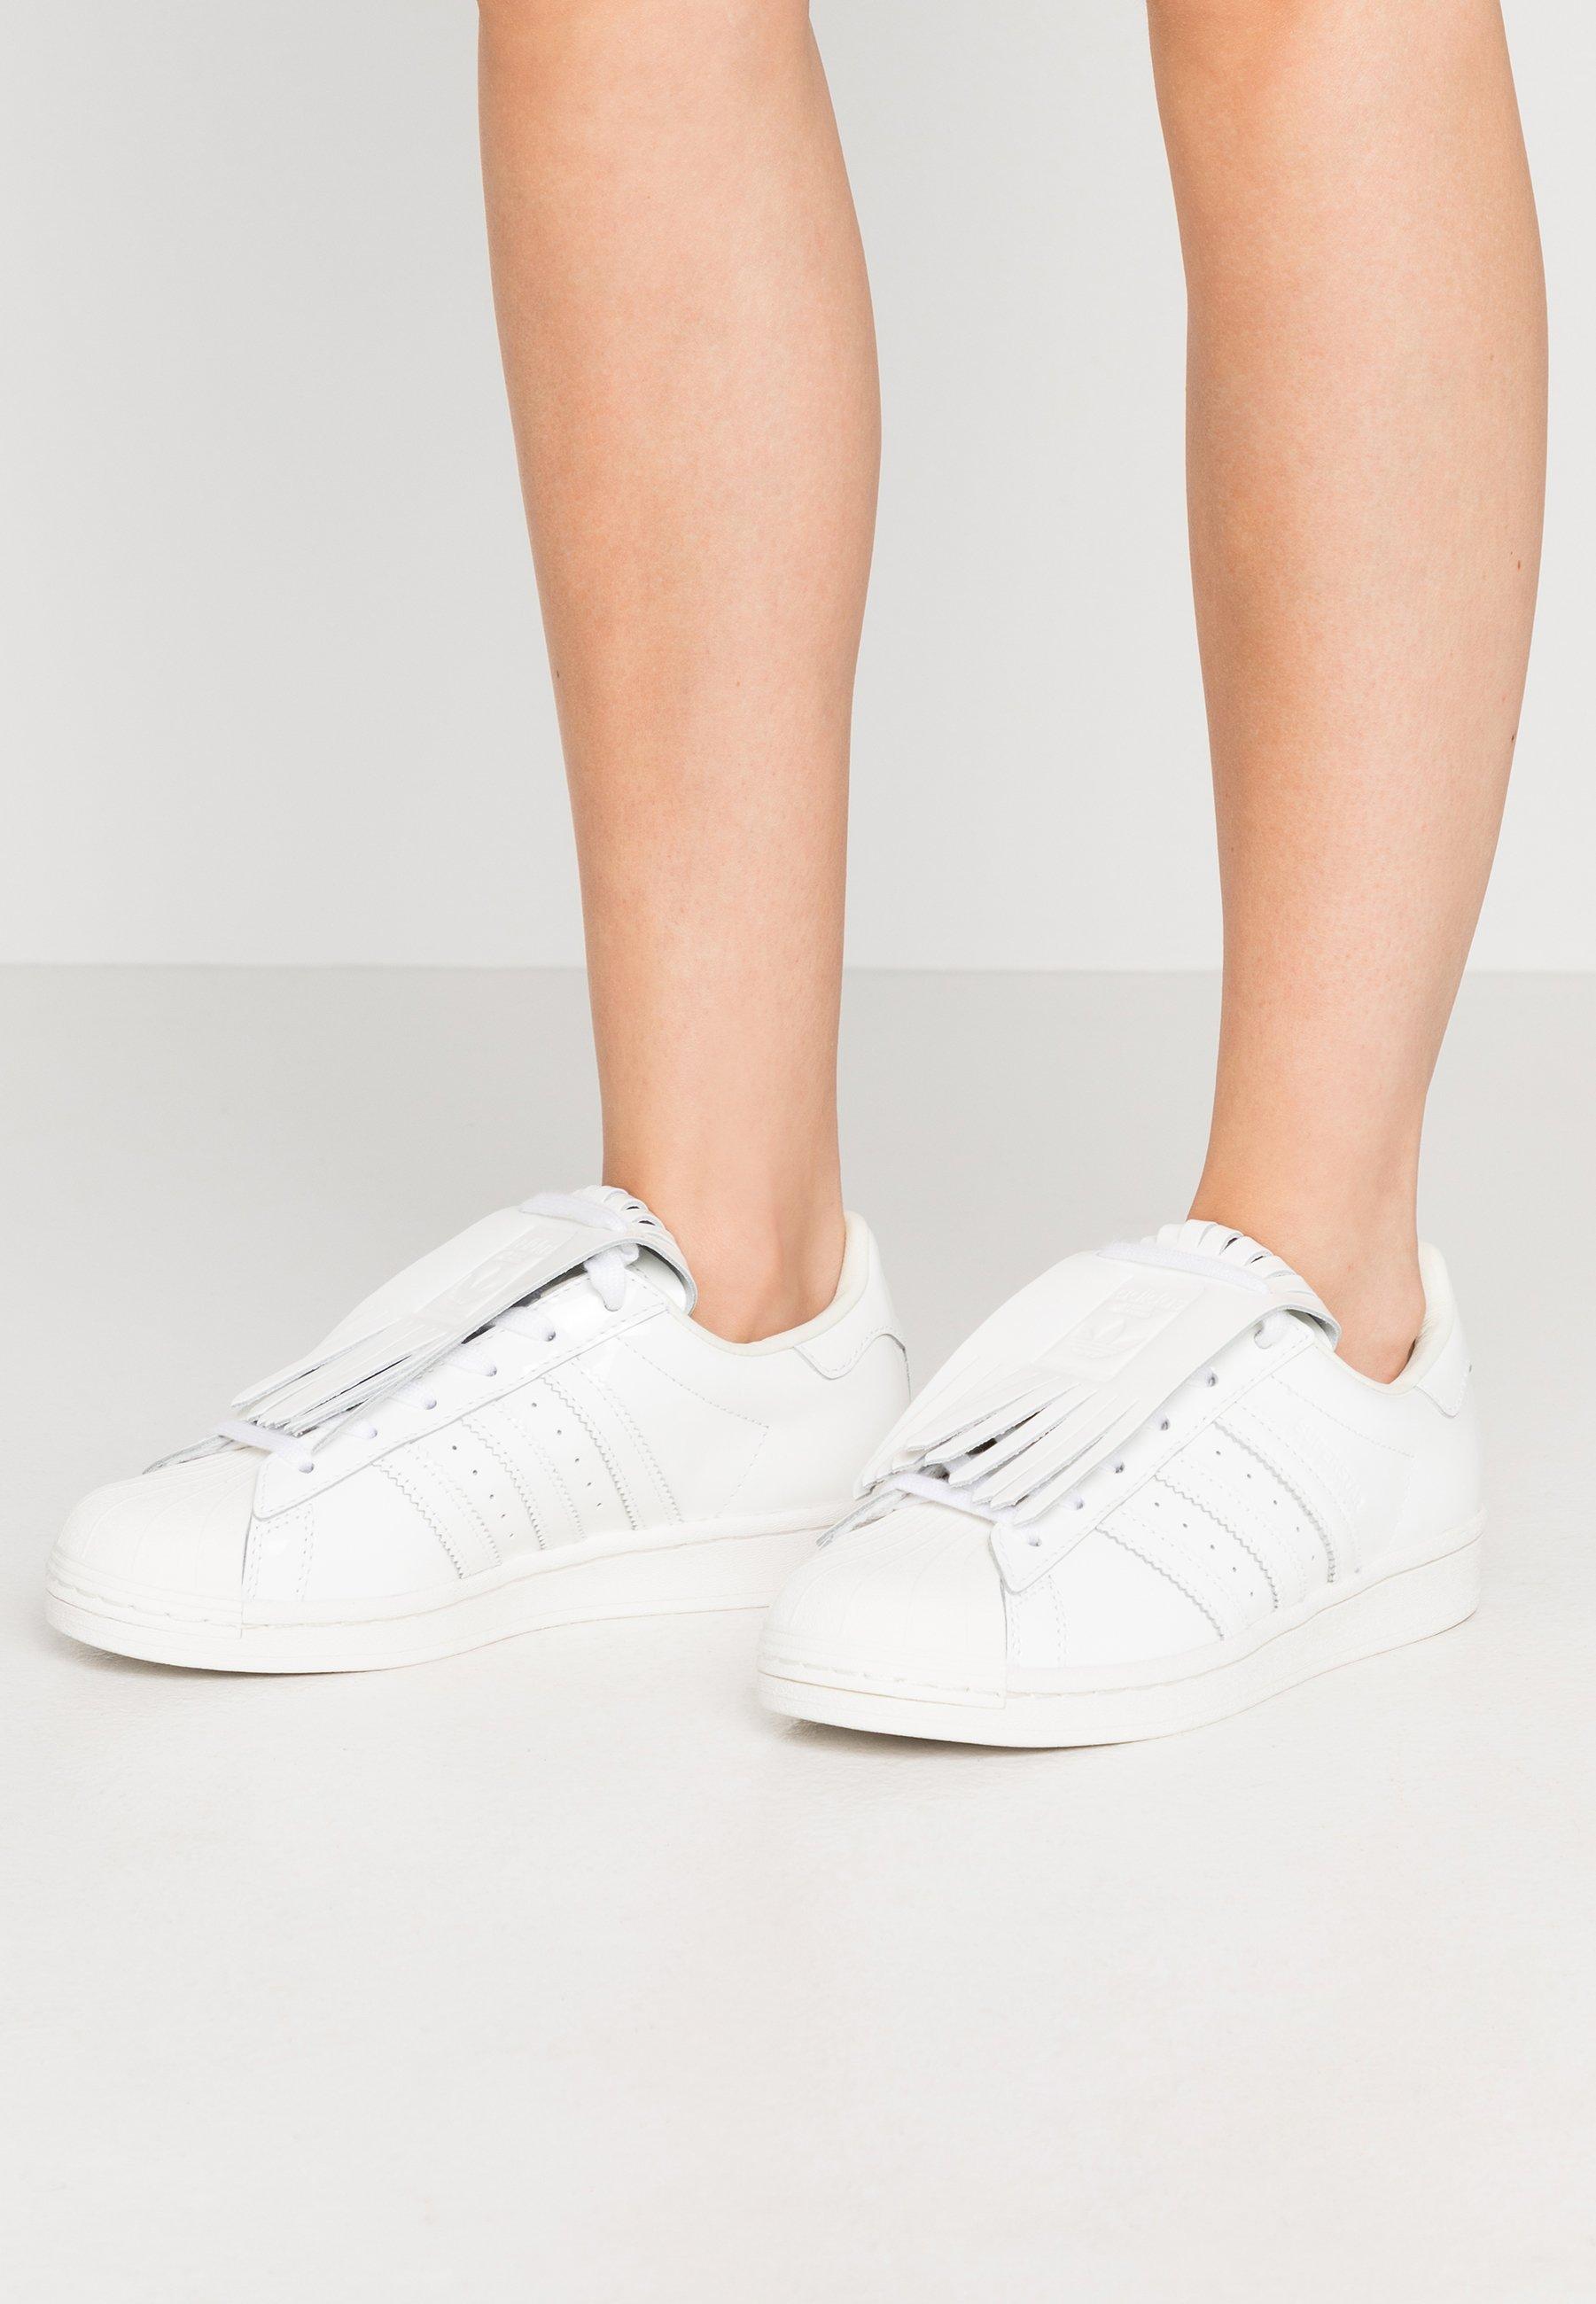 Gutes Angebot adidas Originals SUPERSTAR - Sneaker low - footwear white/offwhite/gold metallic | Damenbekleidung 2020